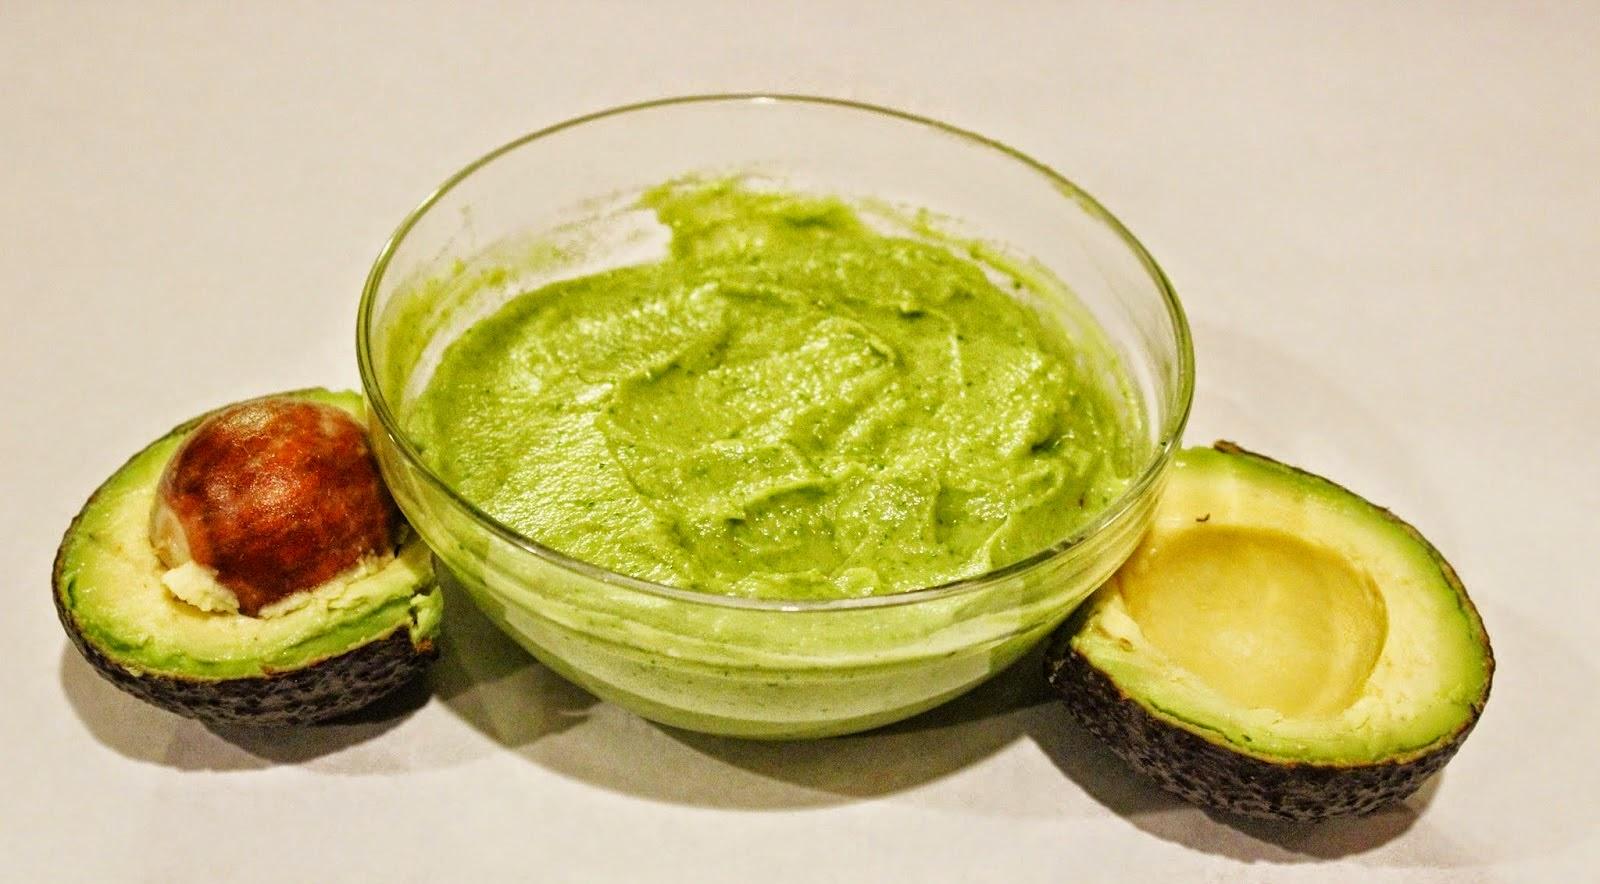 avocado guacamole/ chutney